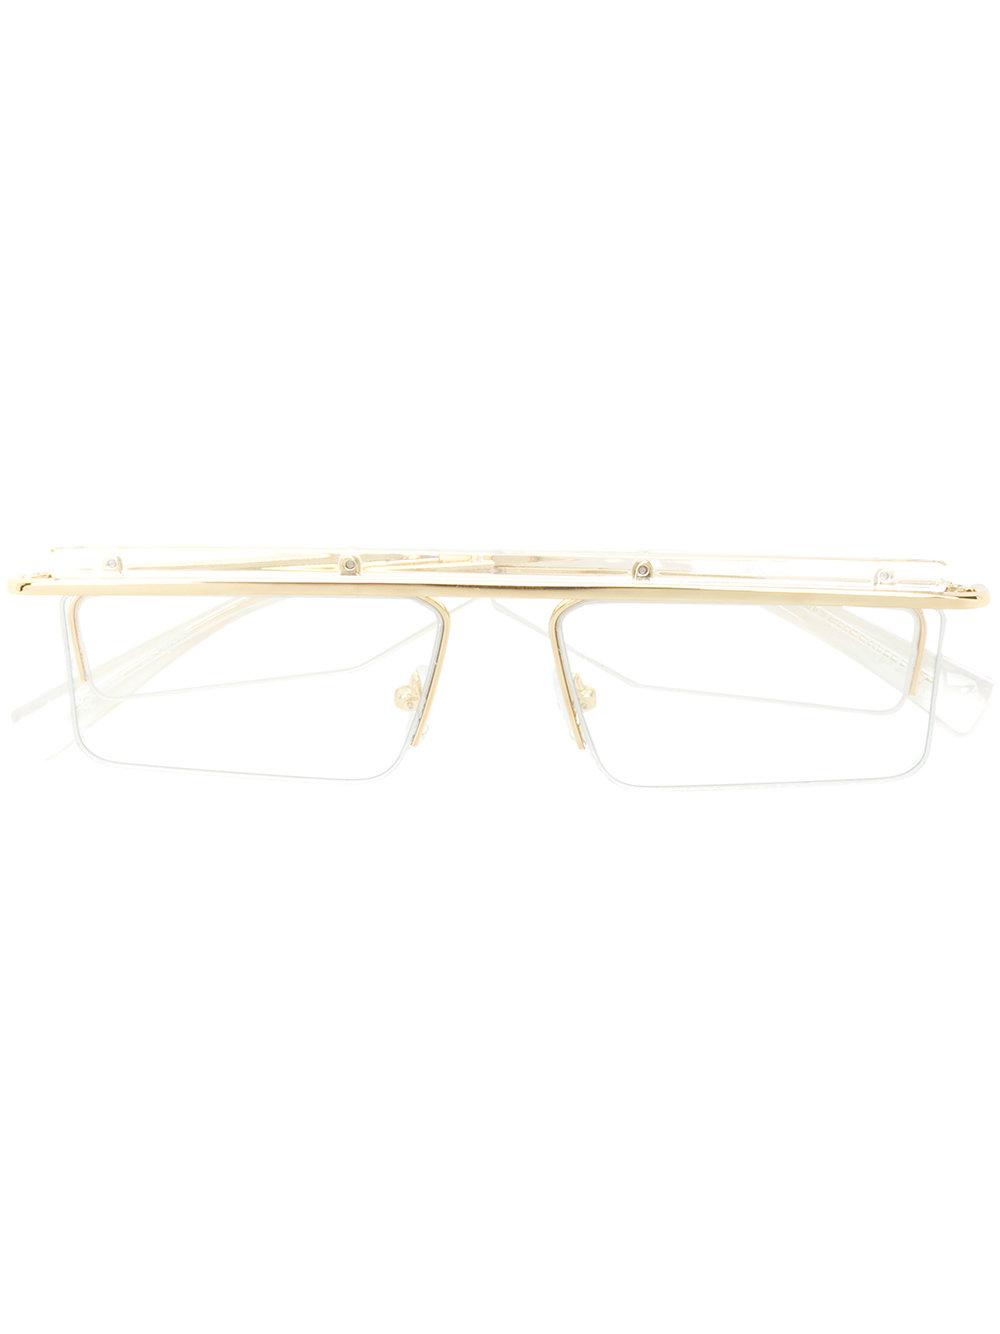 5 le specs designer eyeglasses online eyeglasses brands list buy optical prescription frames 1 Jacques Marie Mage face a face